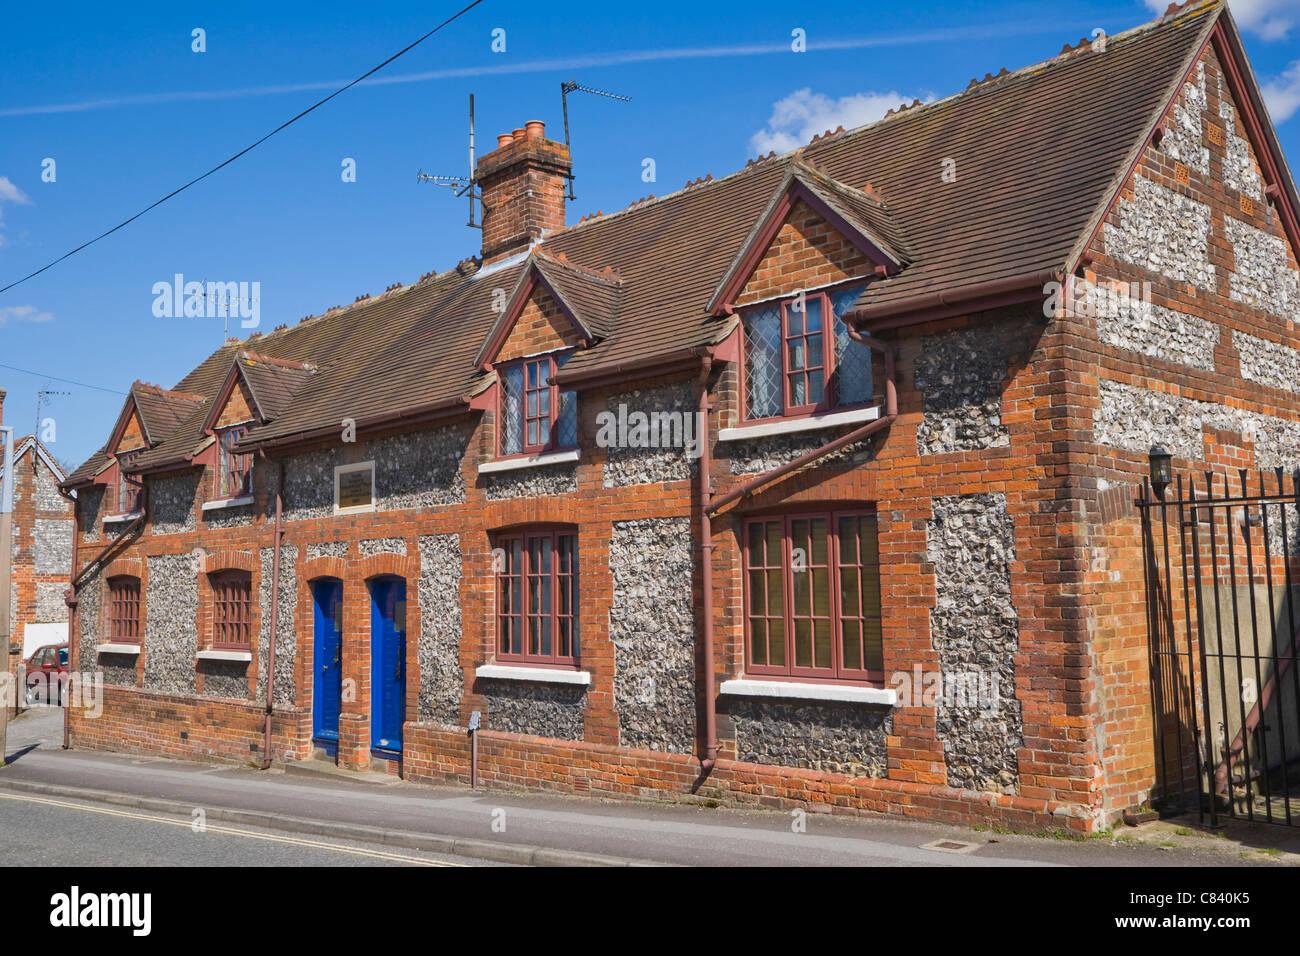 Building of School restored by Charlotte Eliz Pollen in 1872, Marlborough Street, Andover, Hampshire, England, UK - Stock Image